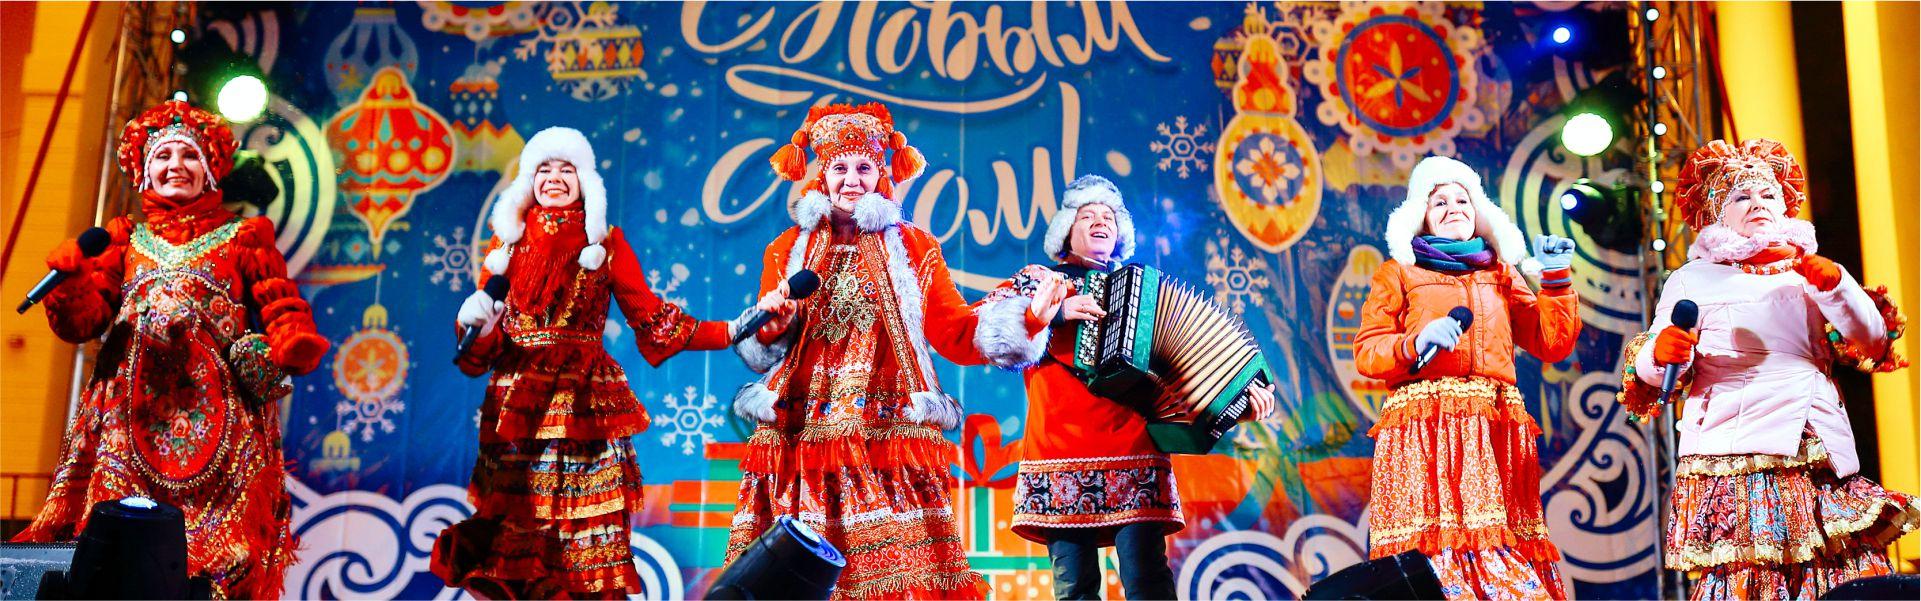 Купить билет онлайн на новый год Чебоксары на AfishaCheboksary.ru